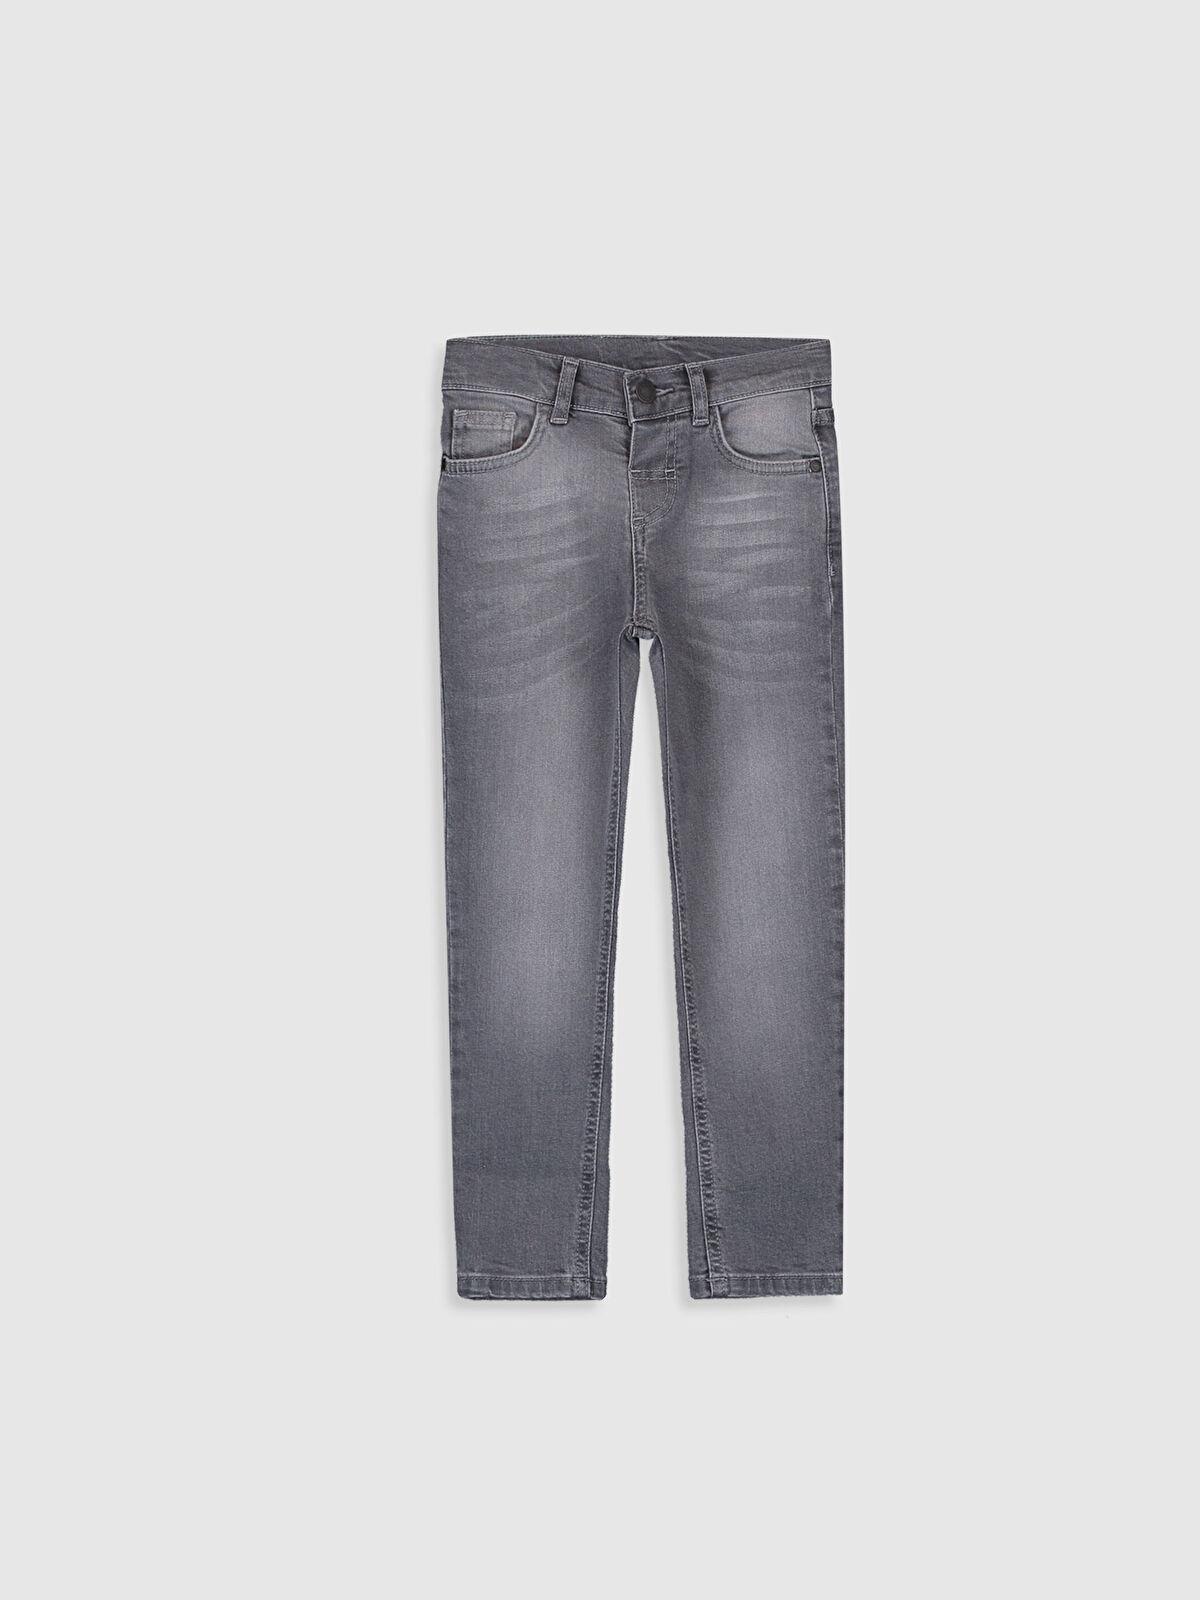 Erkek Çocuk Slim Jean Pantolon - LC WAIKIKI